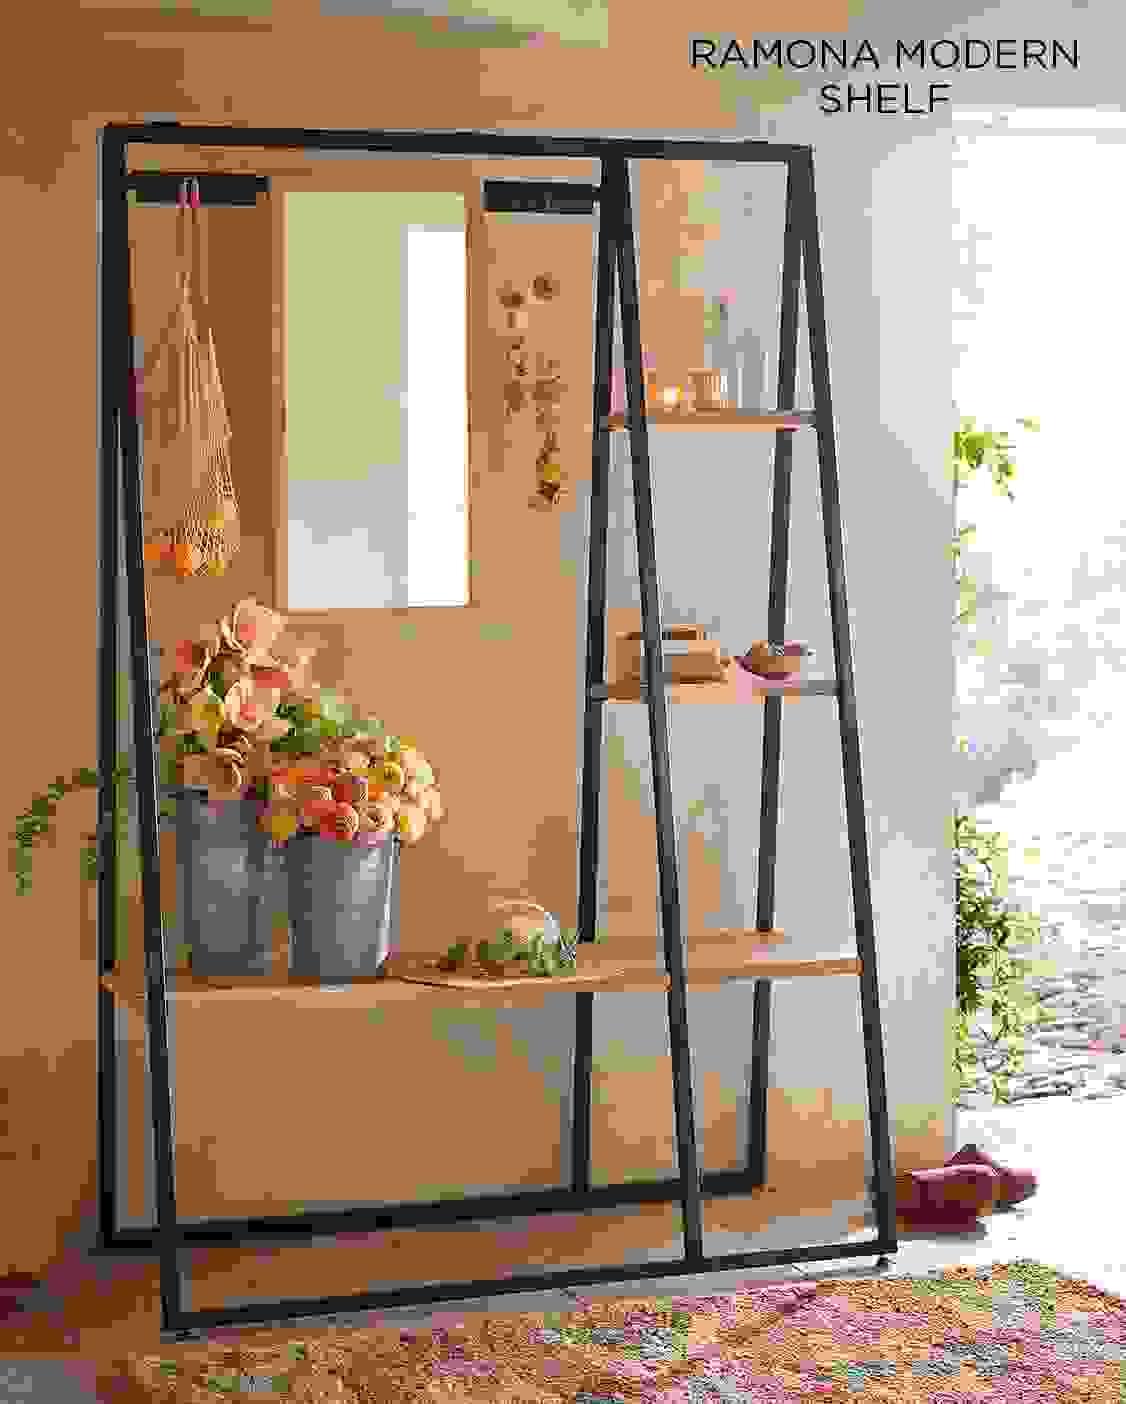 Ramona Modern Shelf